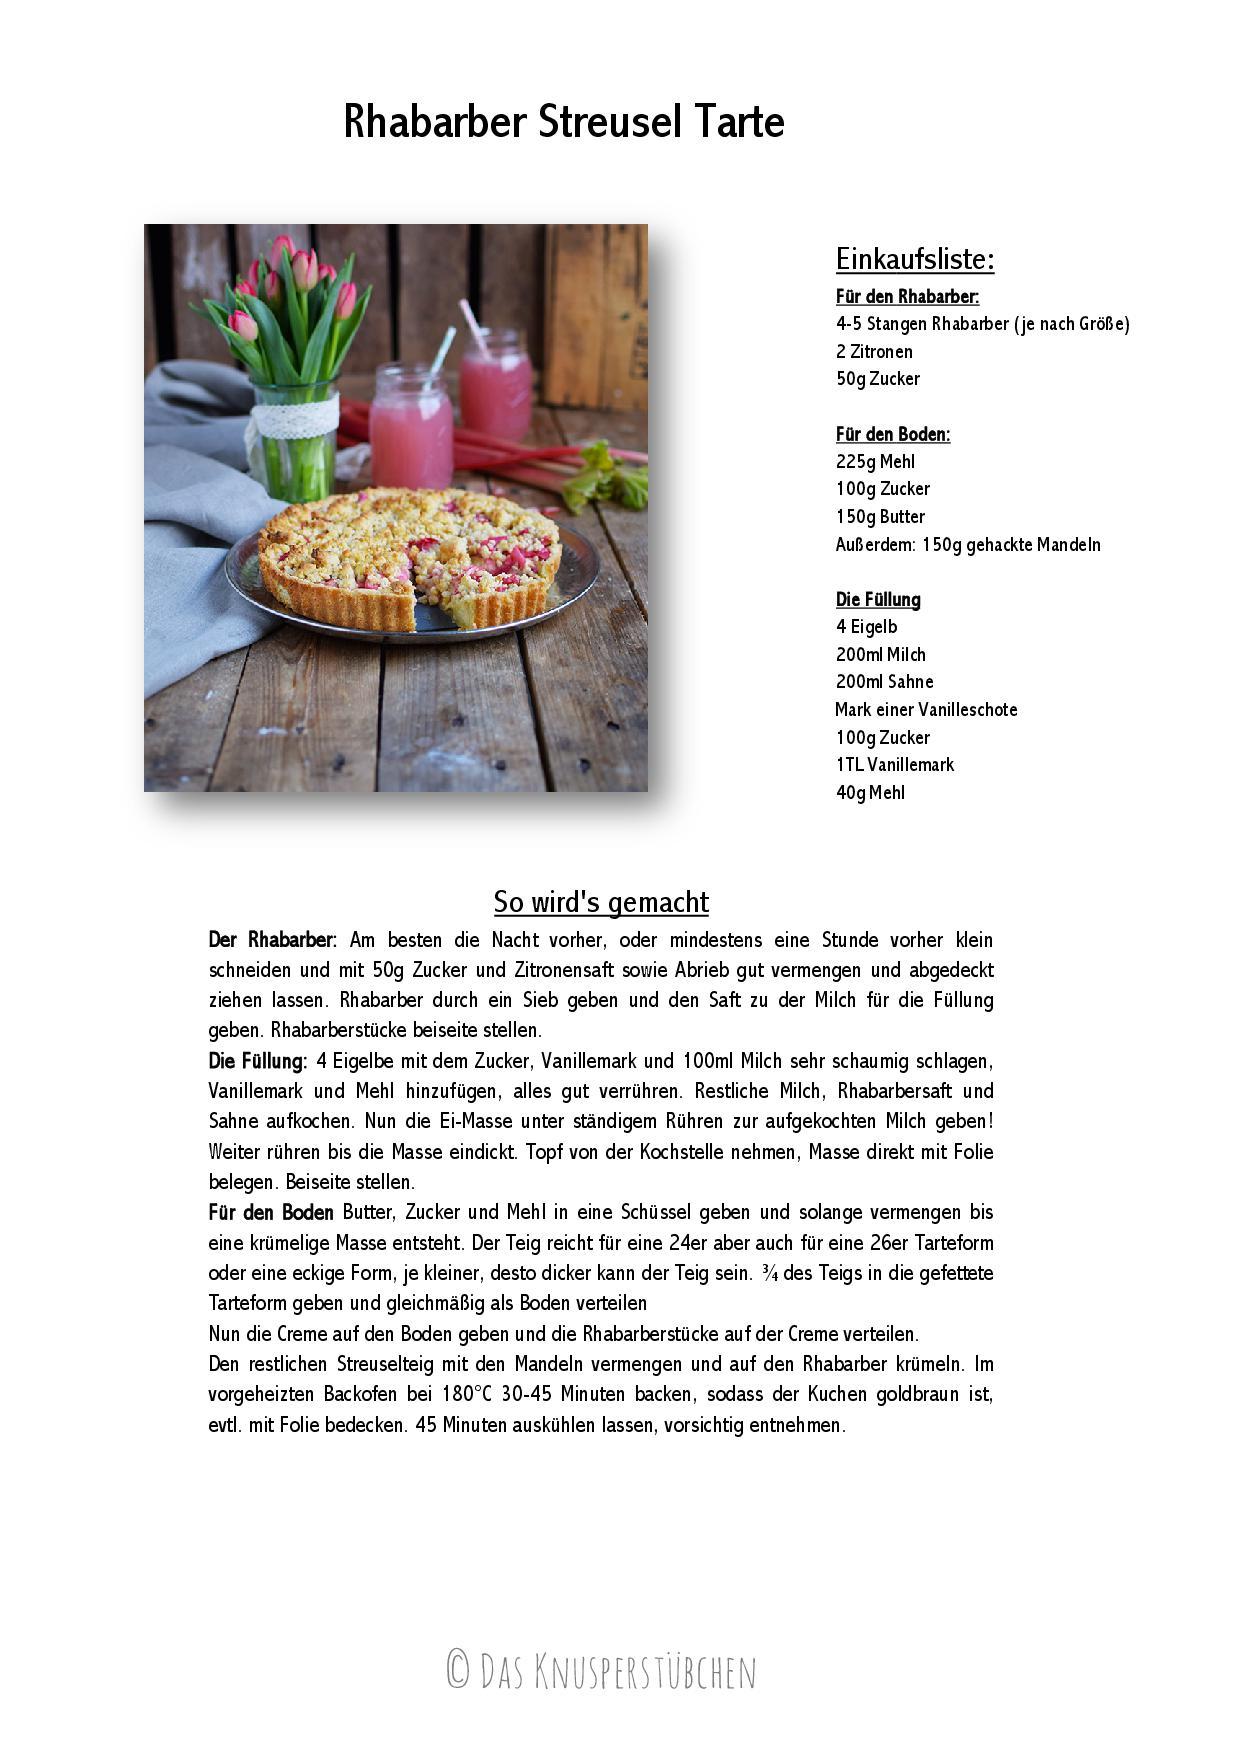 Rhabarber Streusel Tarte - Rhubarb Crumble Tart-001